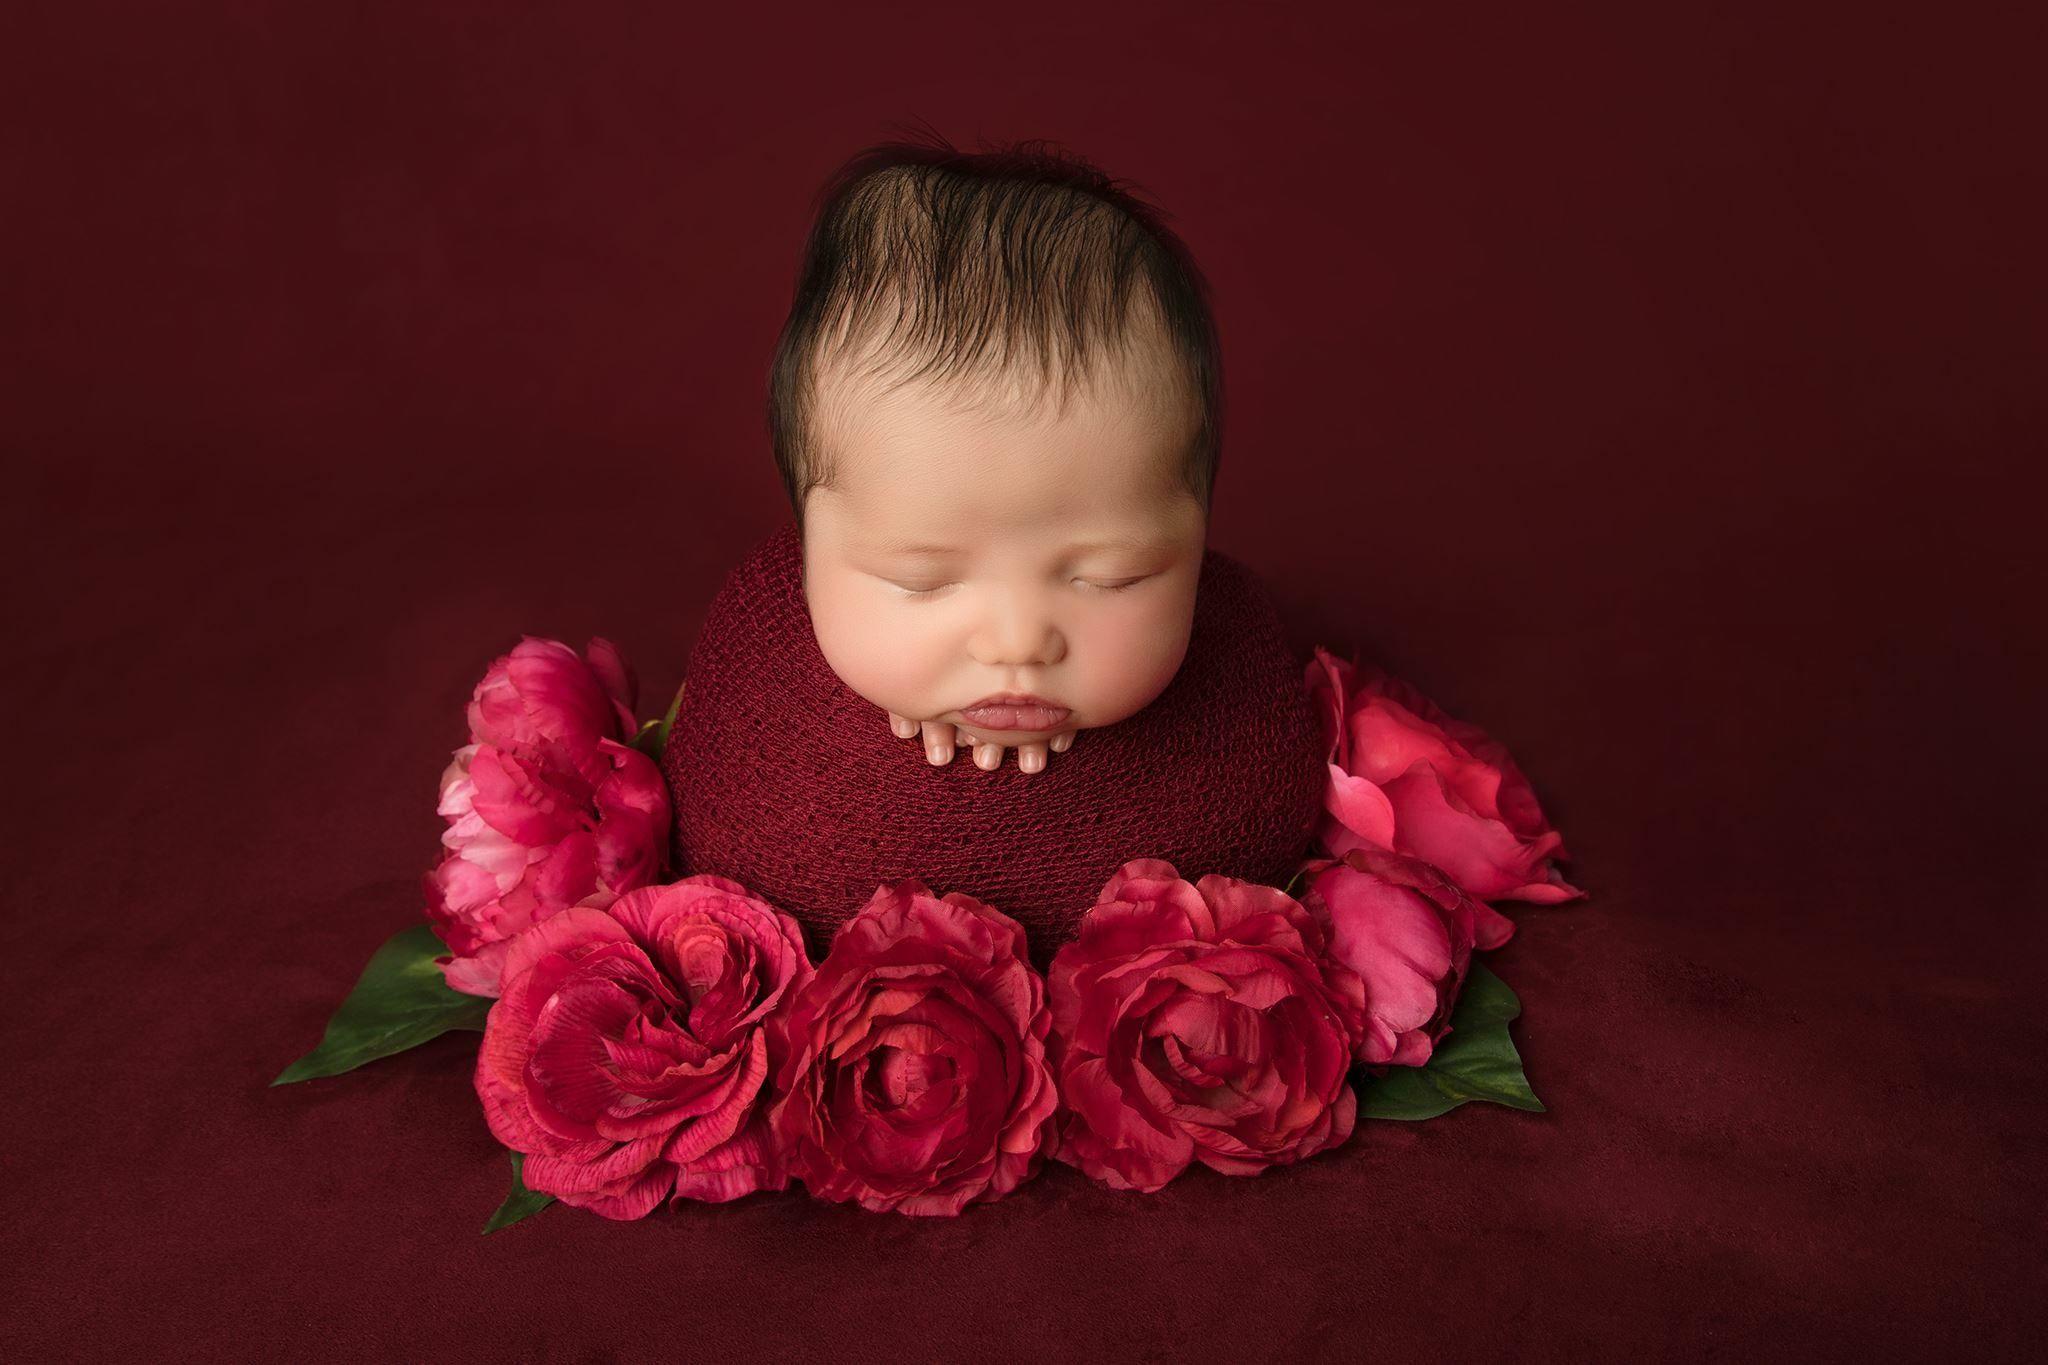 Andrea godfrey photography newborn photography potato sack pose burgundy 15 days old floral baby